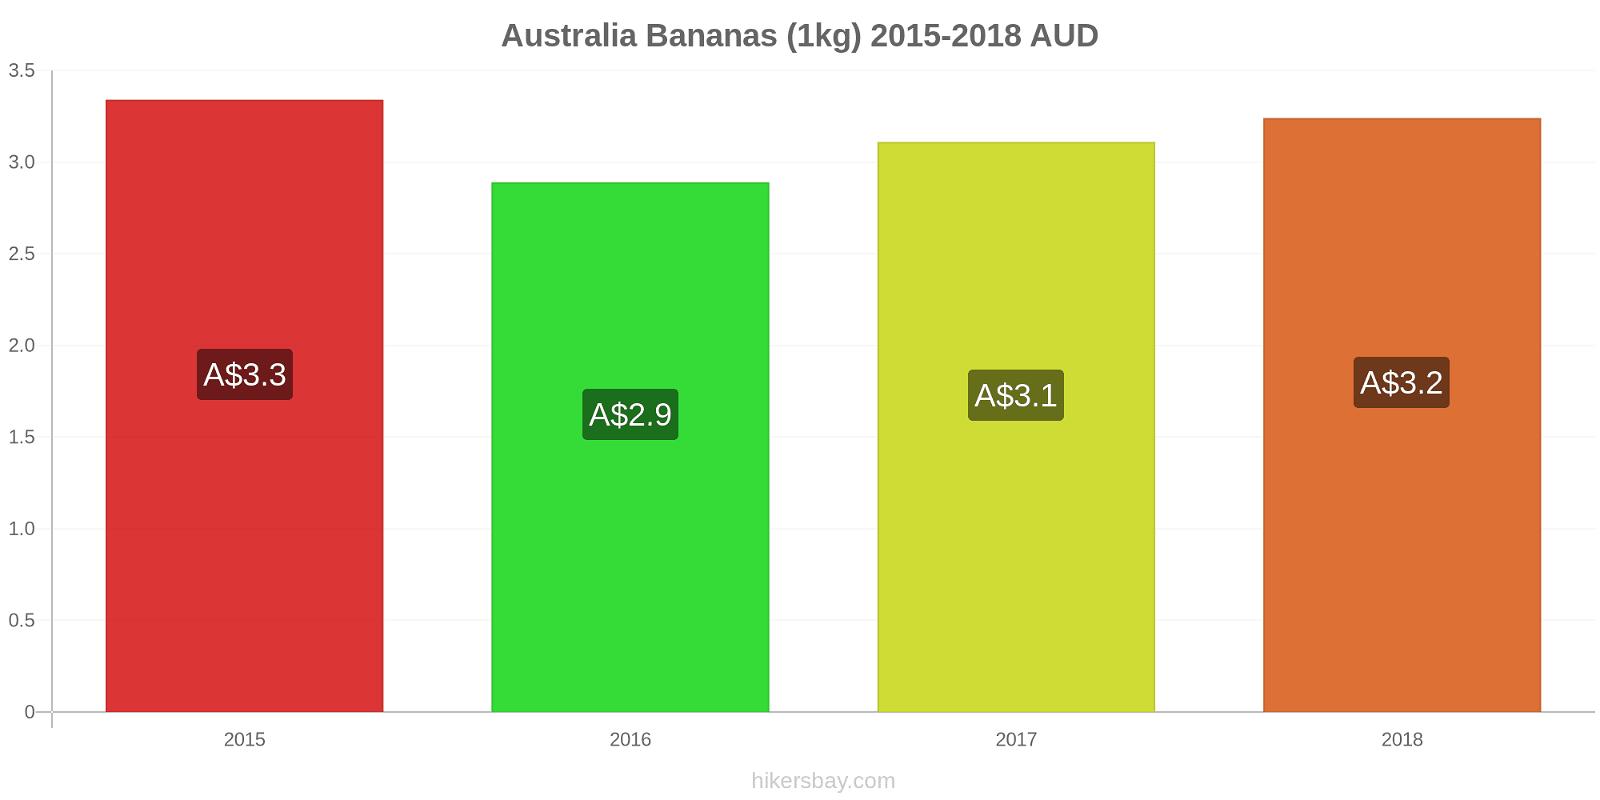 Australia price changes Bananas (1kg) hikersbay.com